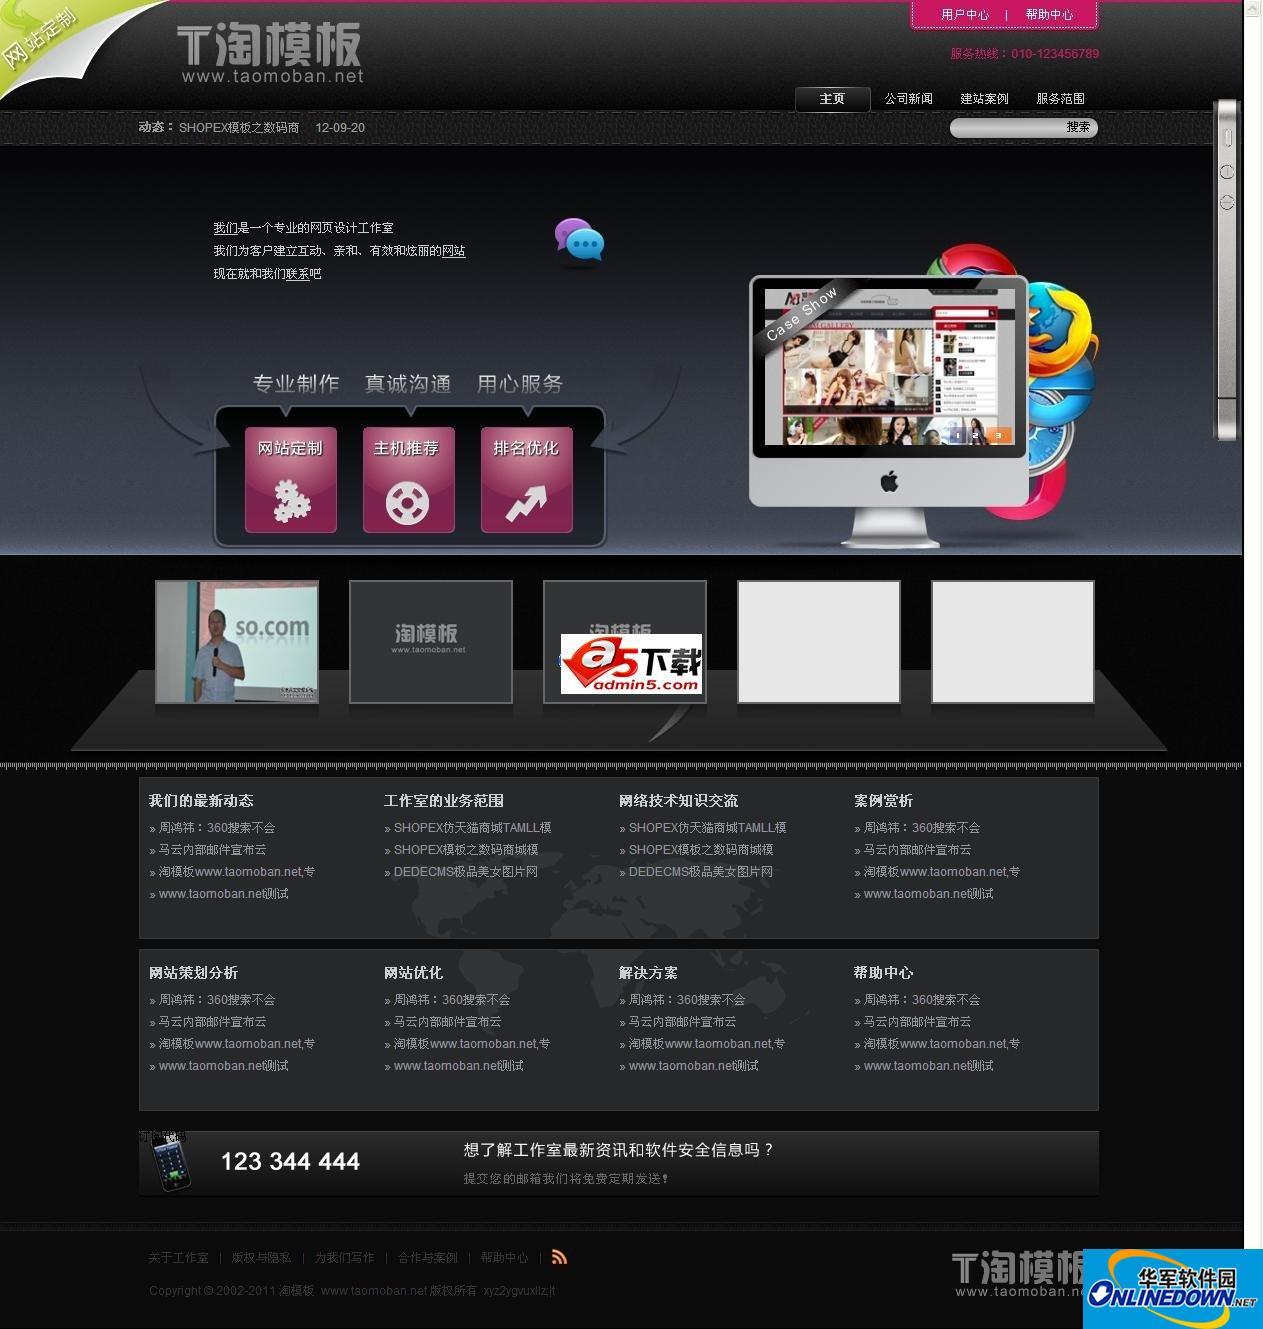 网络工作室整站 for Dedecms 5.7 SP1